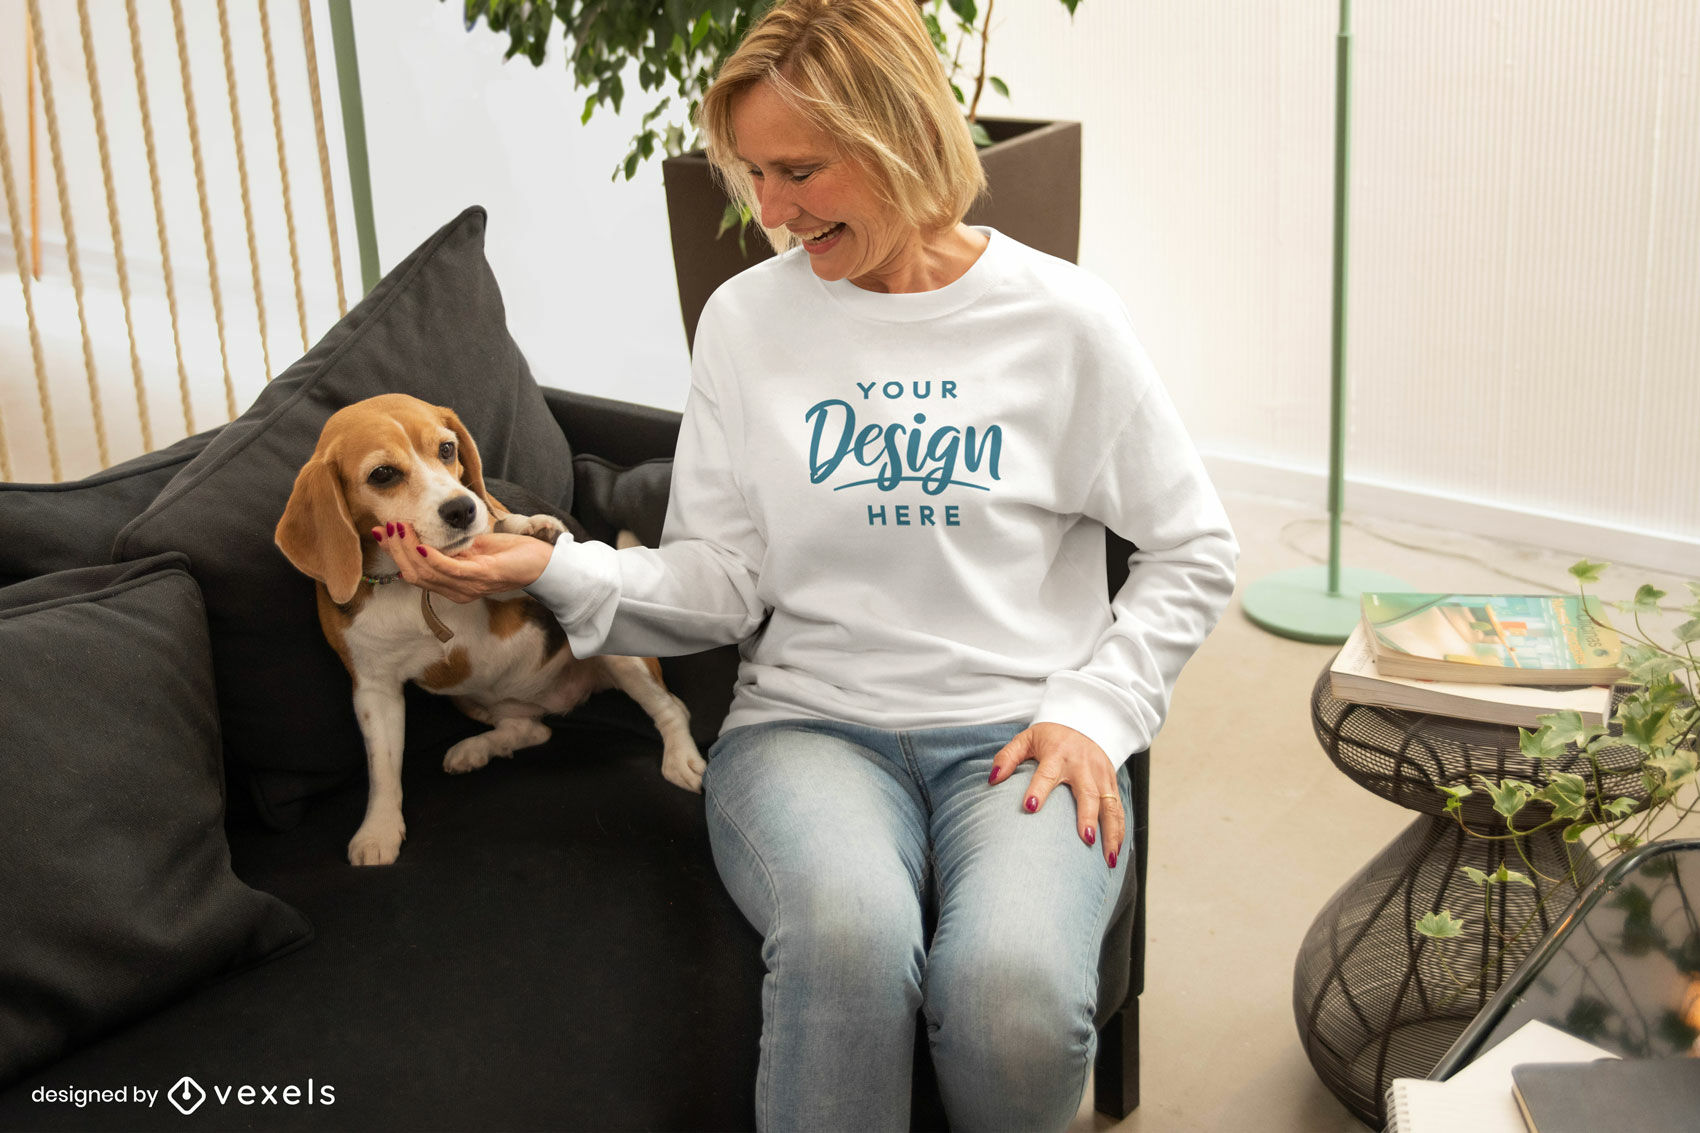 Woman in white sweatshirt with dog mockup